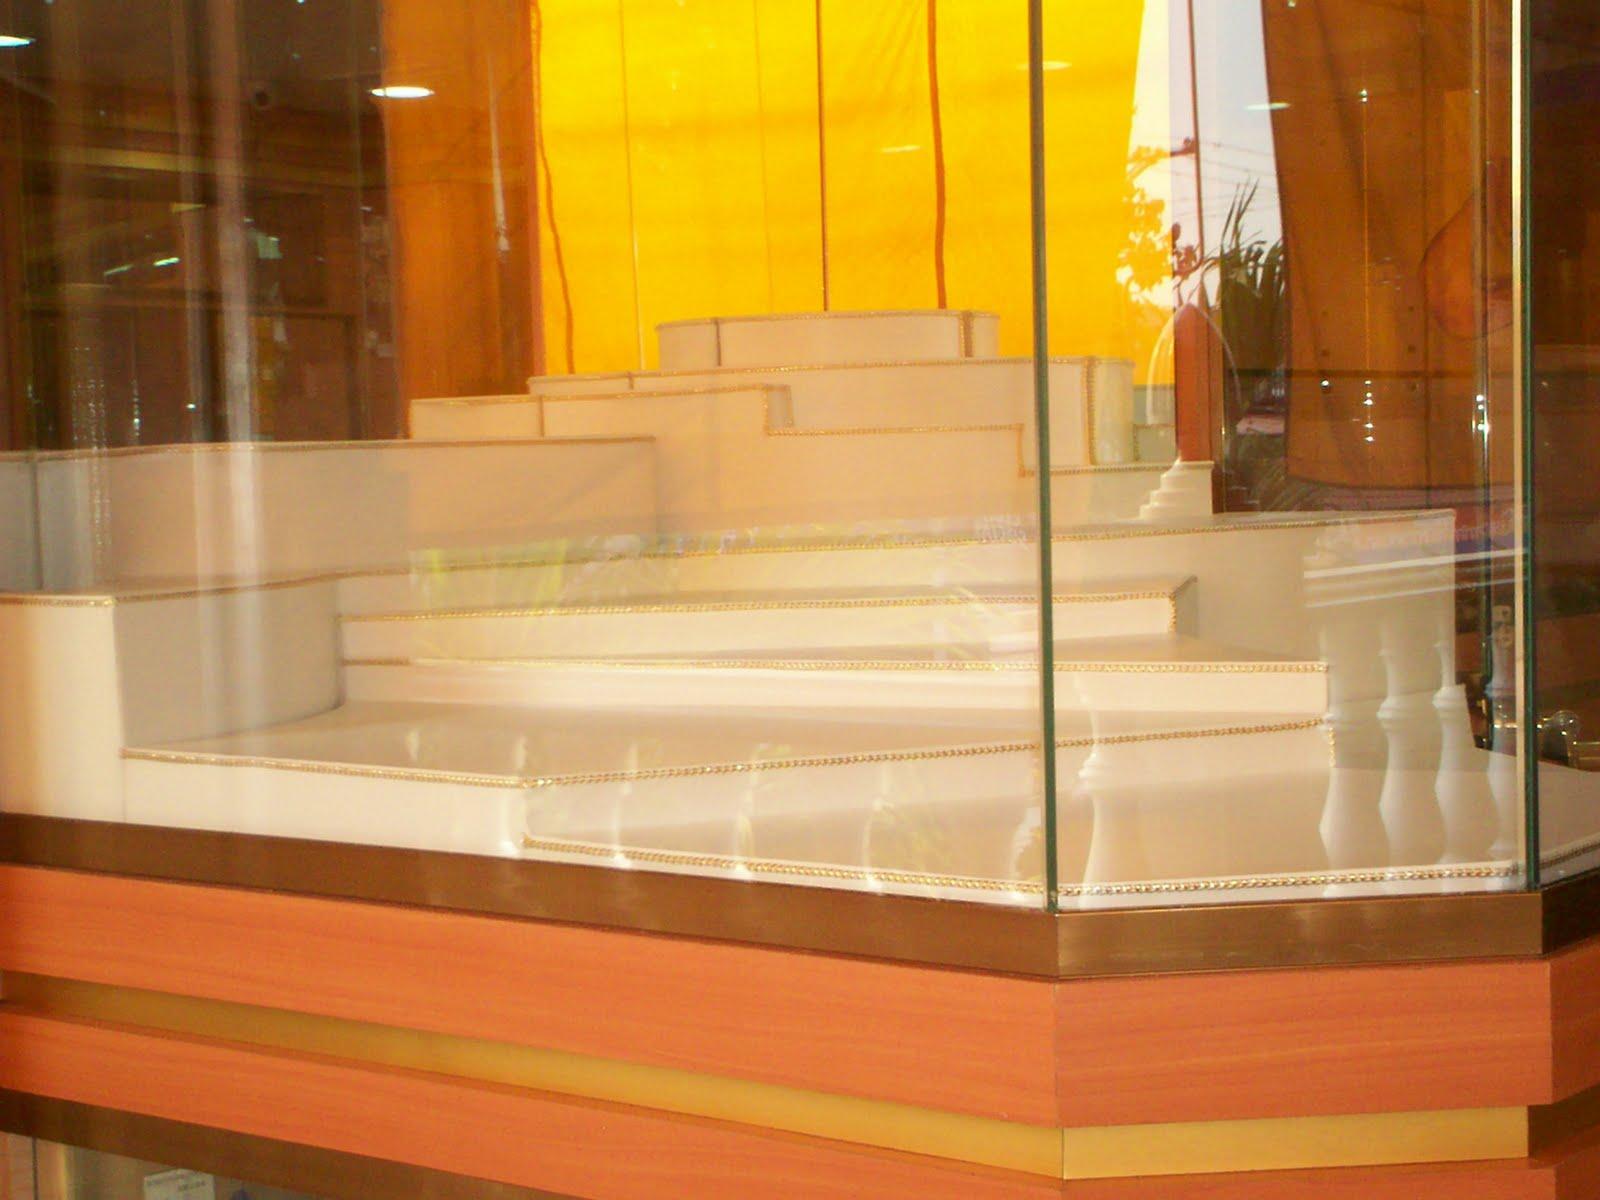 Exhibidores para joyeria decoracion de vitrinas for Decoracion para vitrinas